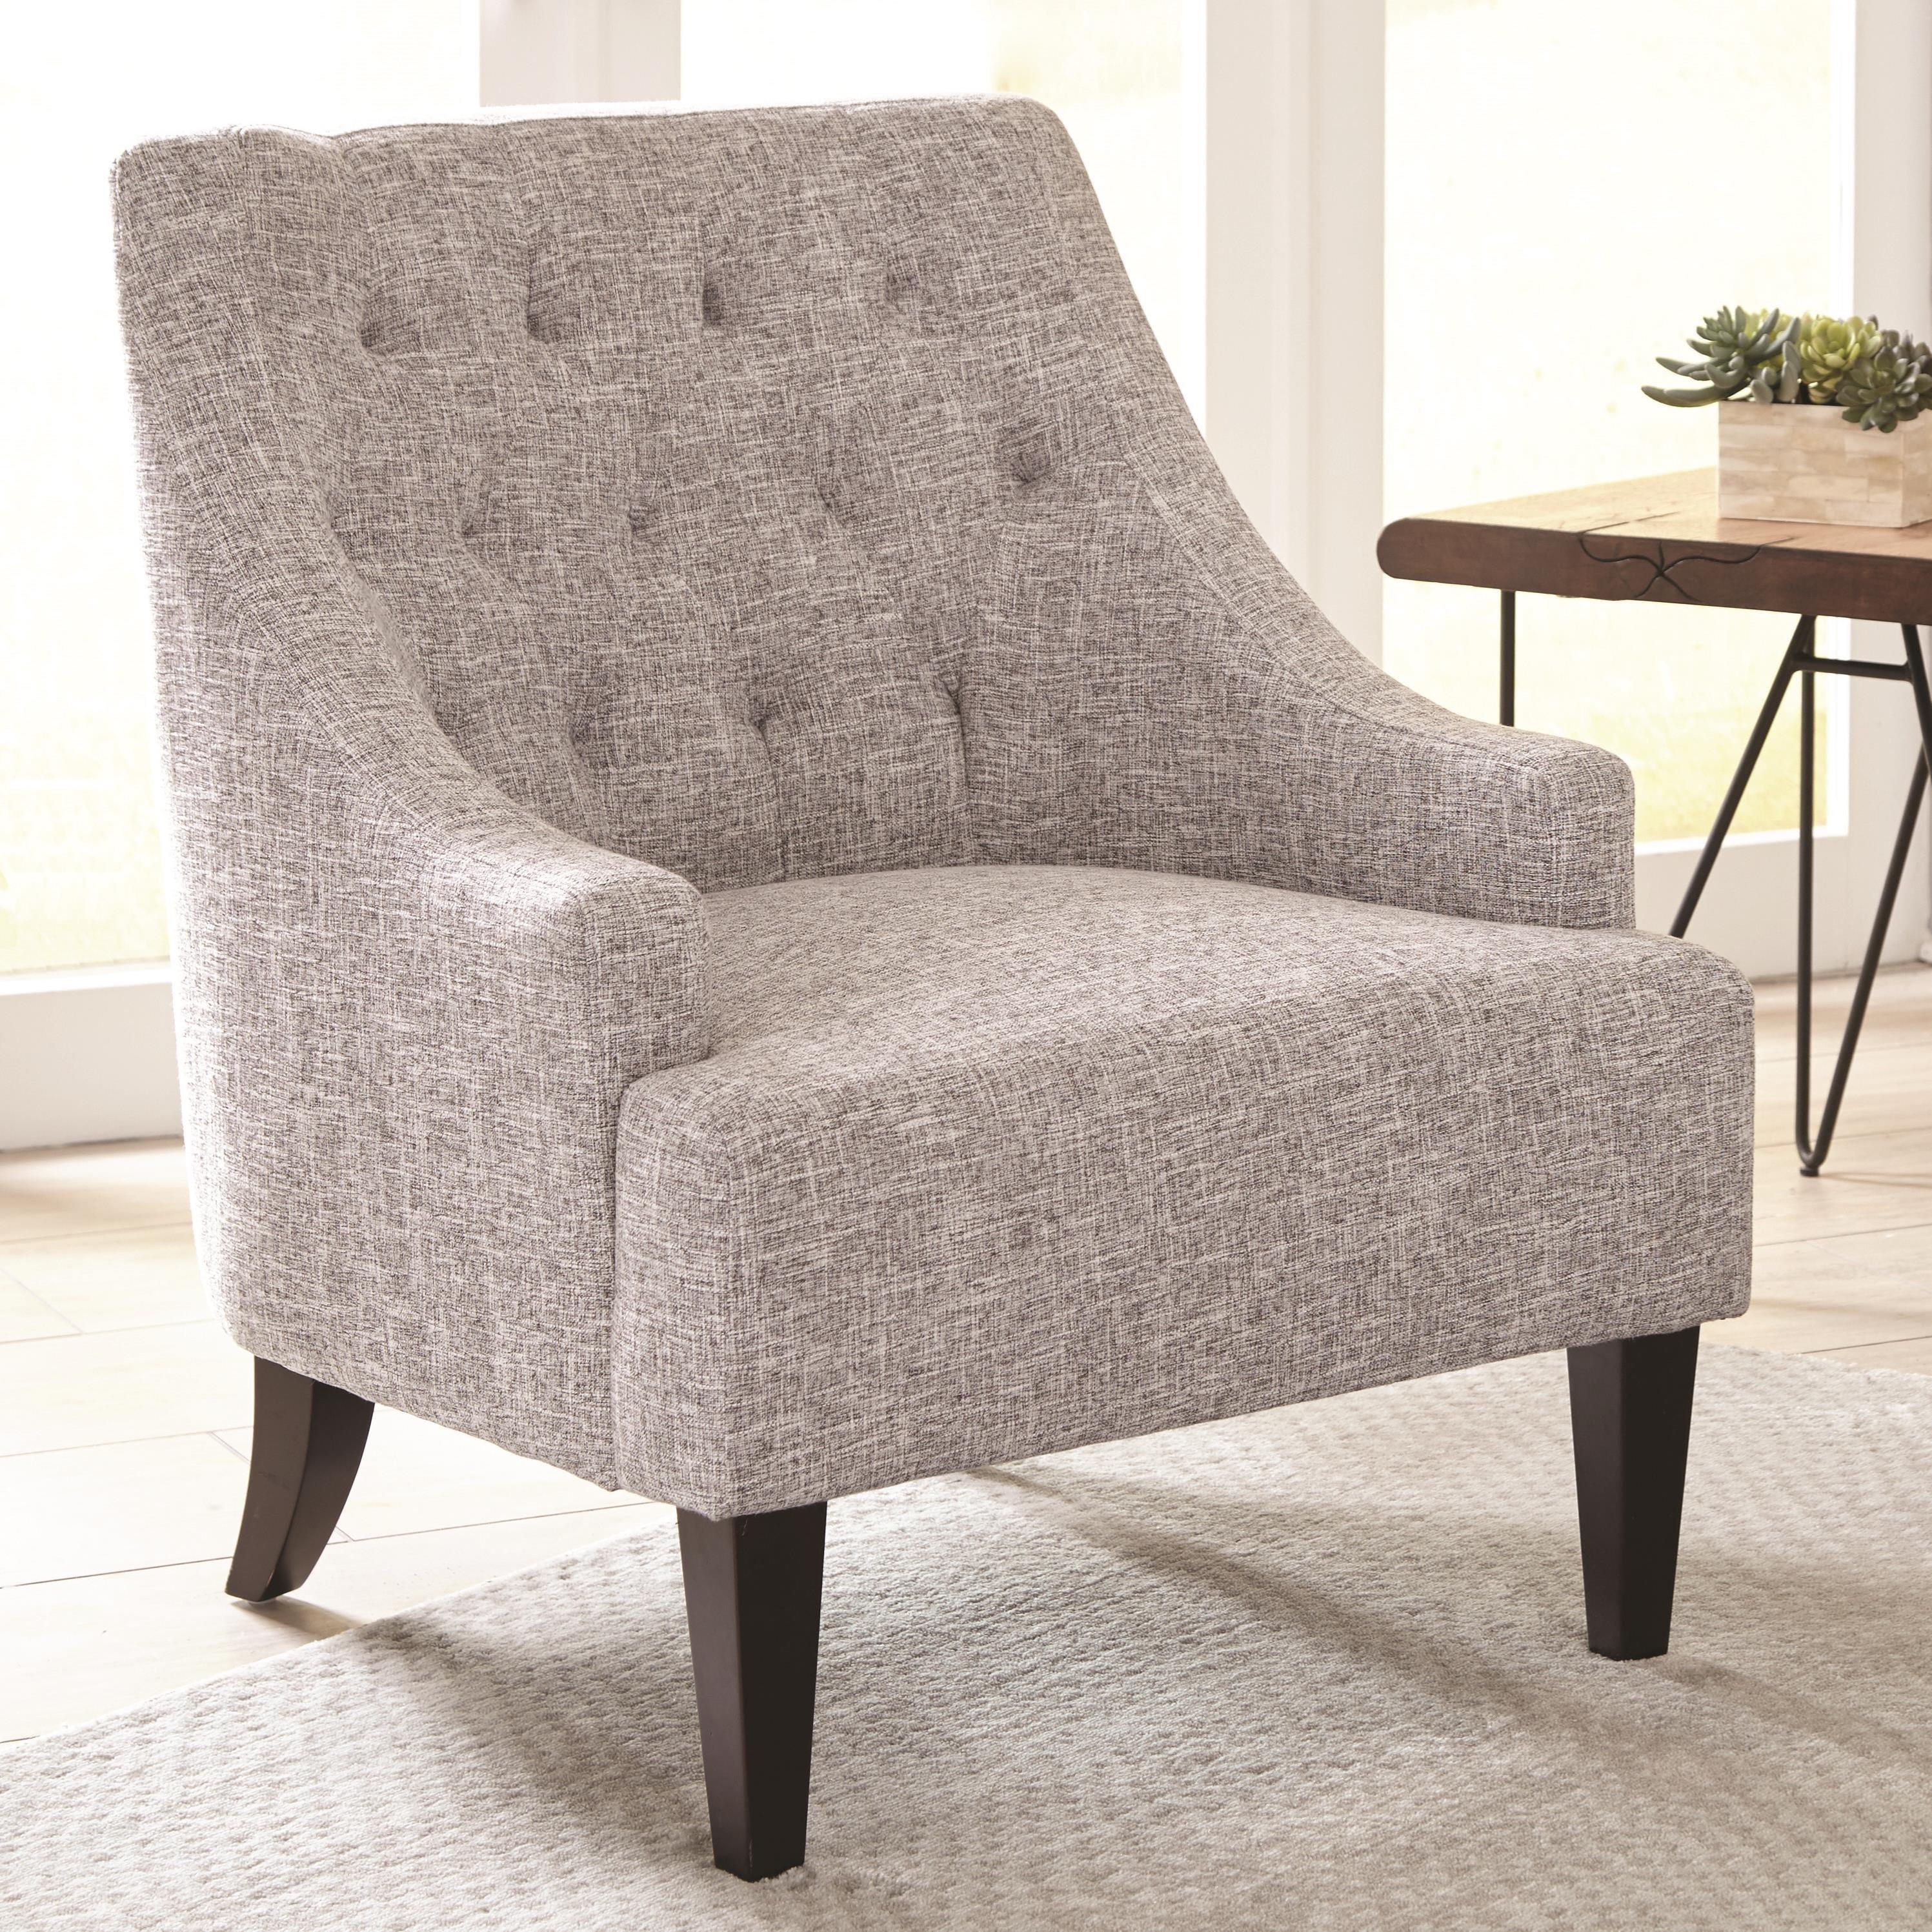 Scott Living 904068 Accent Chair - Item Number: 904068